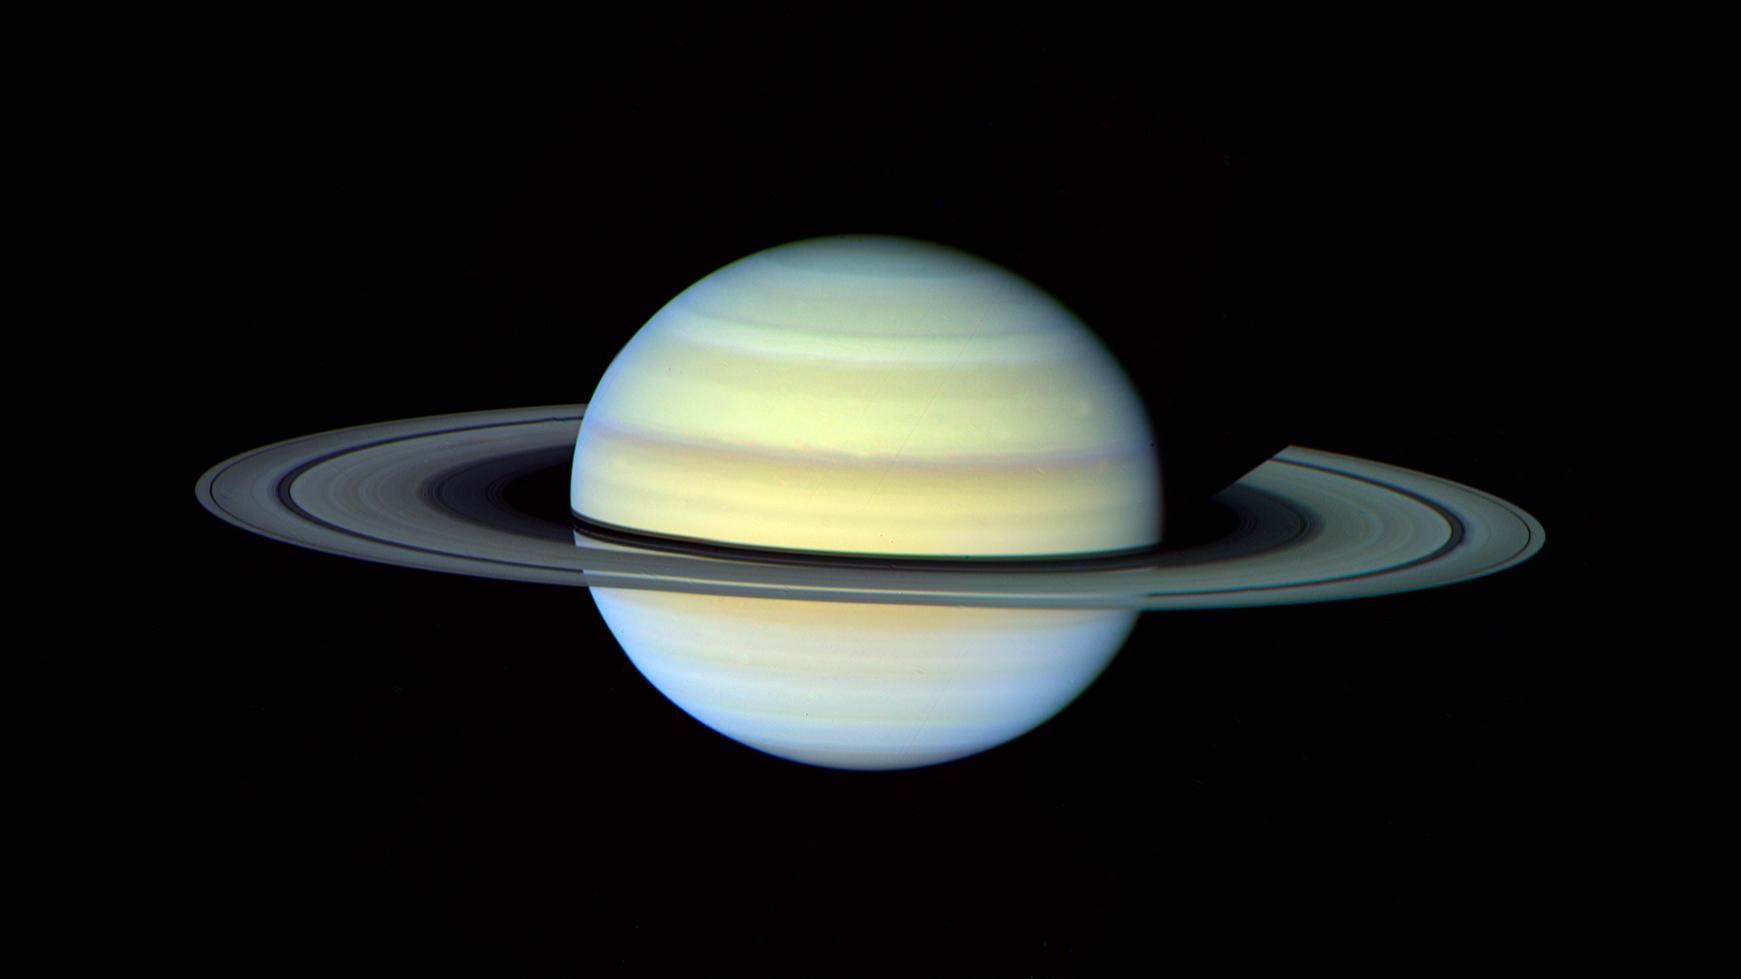 planet saturn information - HD1741×979